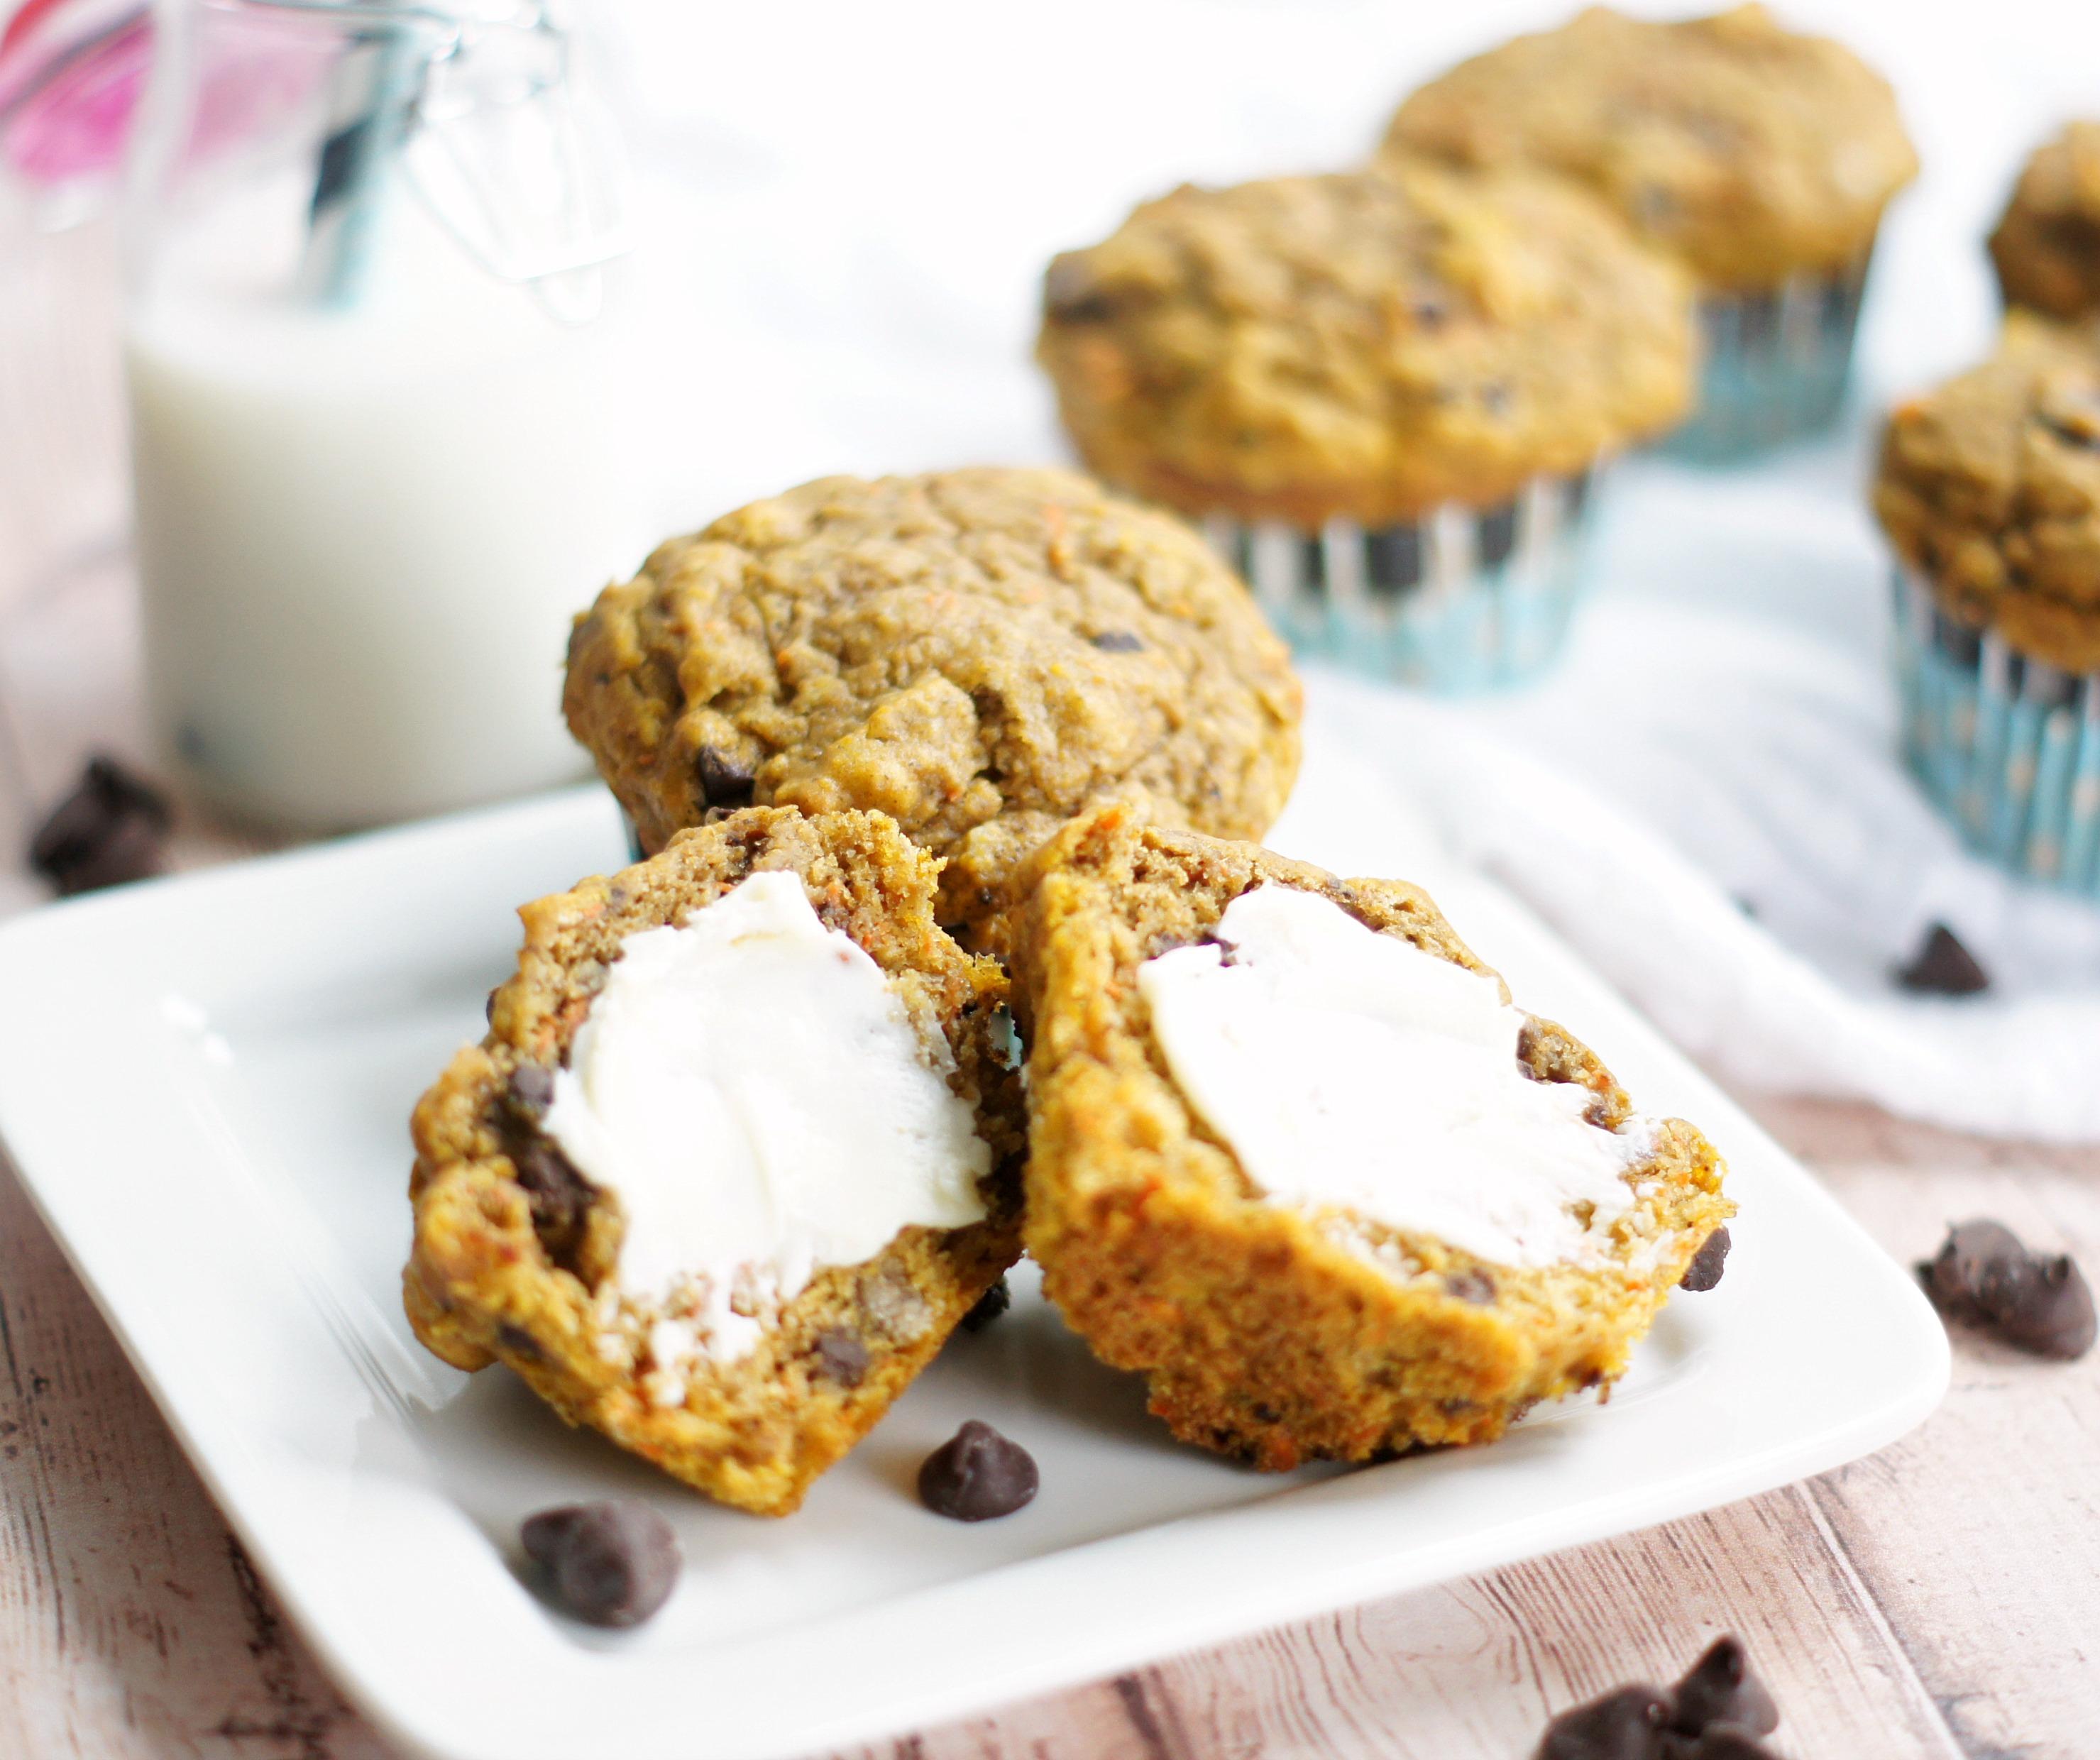 Lowfat pumpkin spice muffins